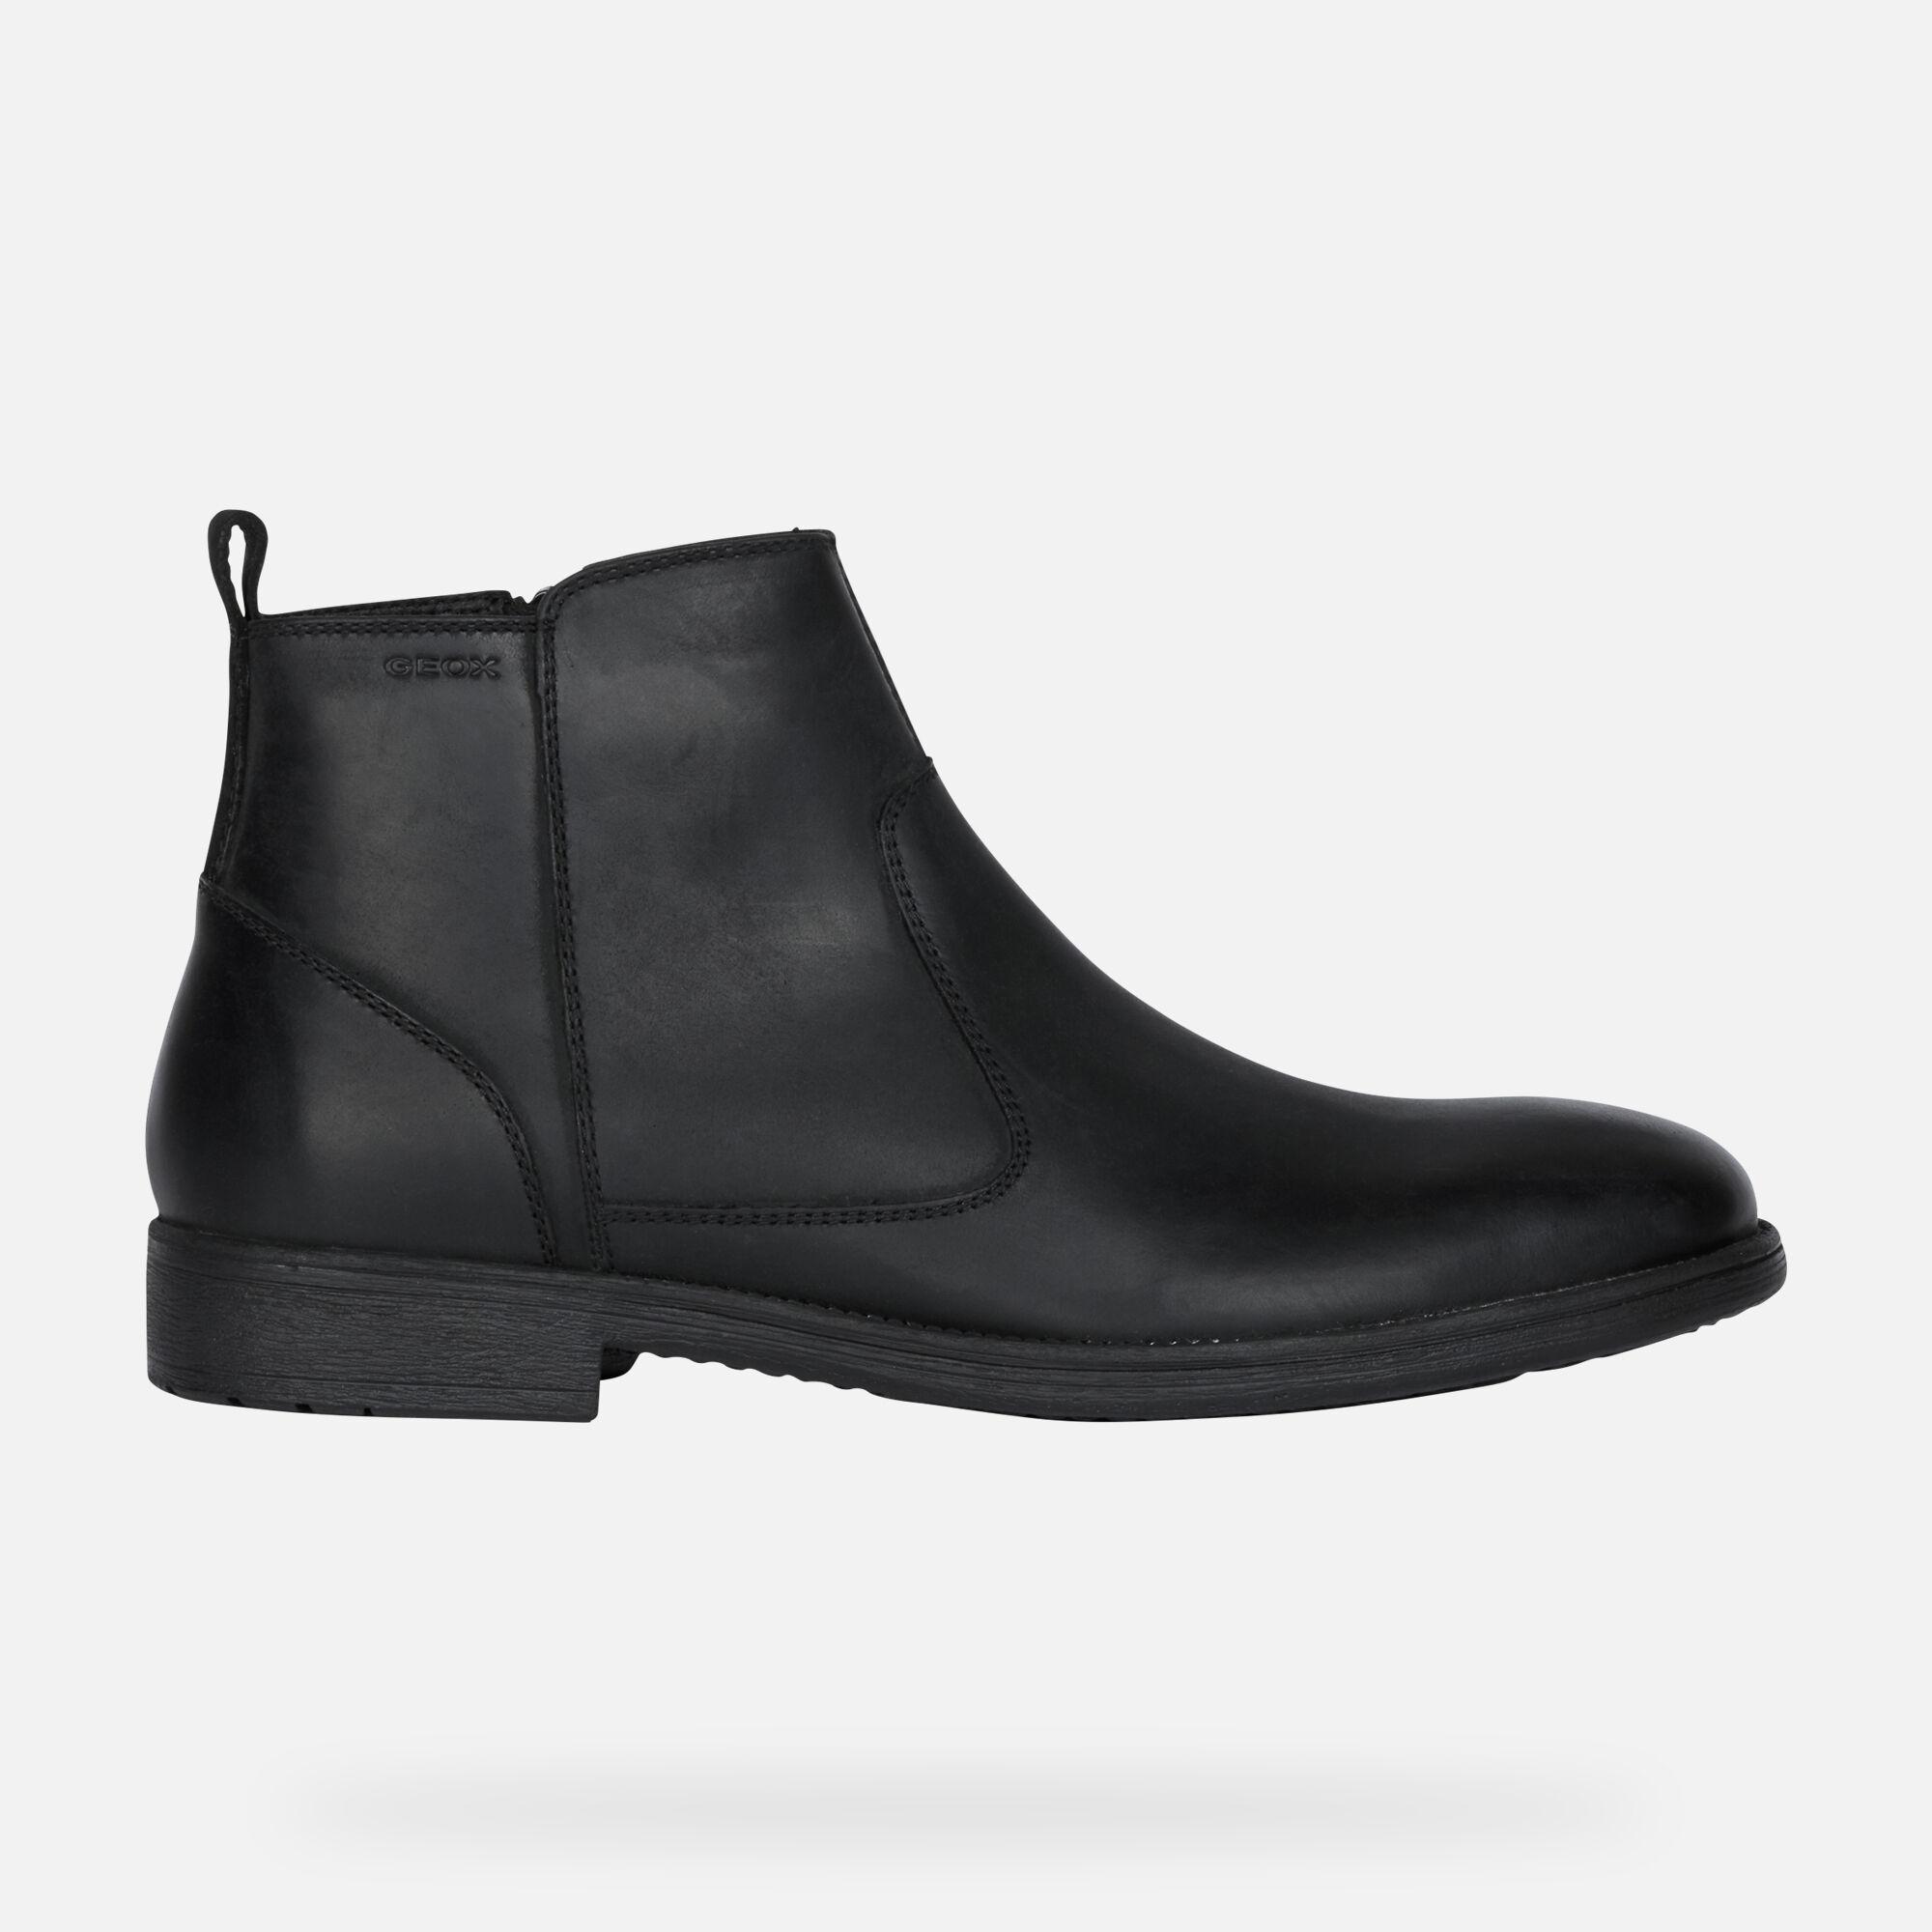 Jaylon Noires® Ligne Homme Bottines Geox En Boutique nw0O8kP